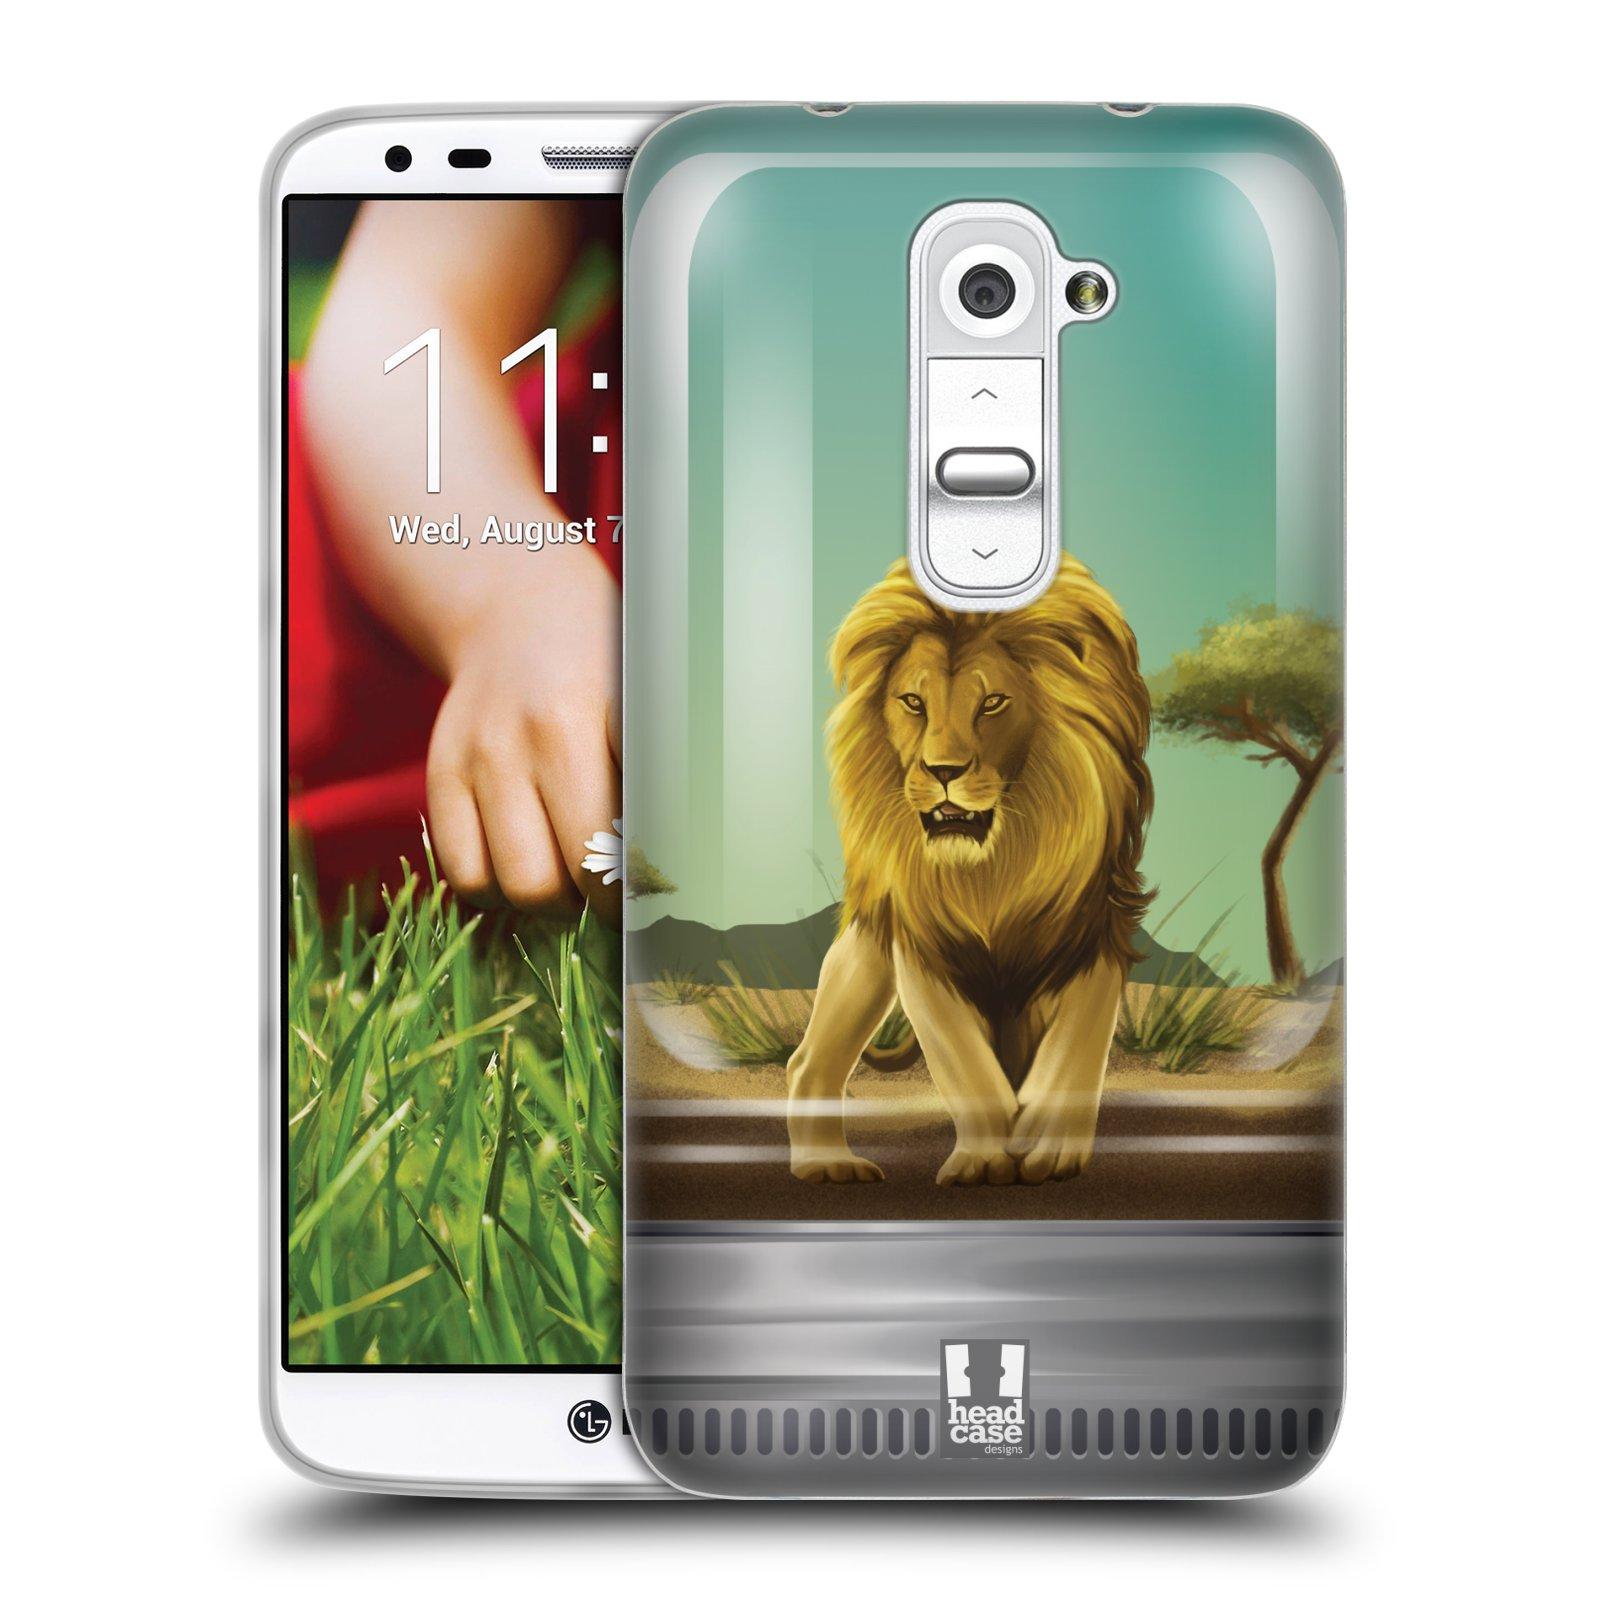 HEAD CASE silikonový obal na mobil LG G2 vzor Zvířátka v těžítku lev